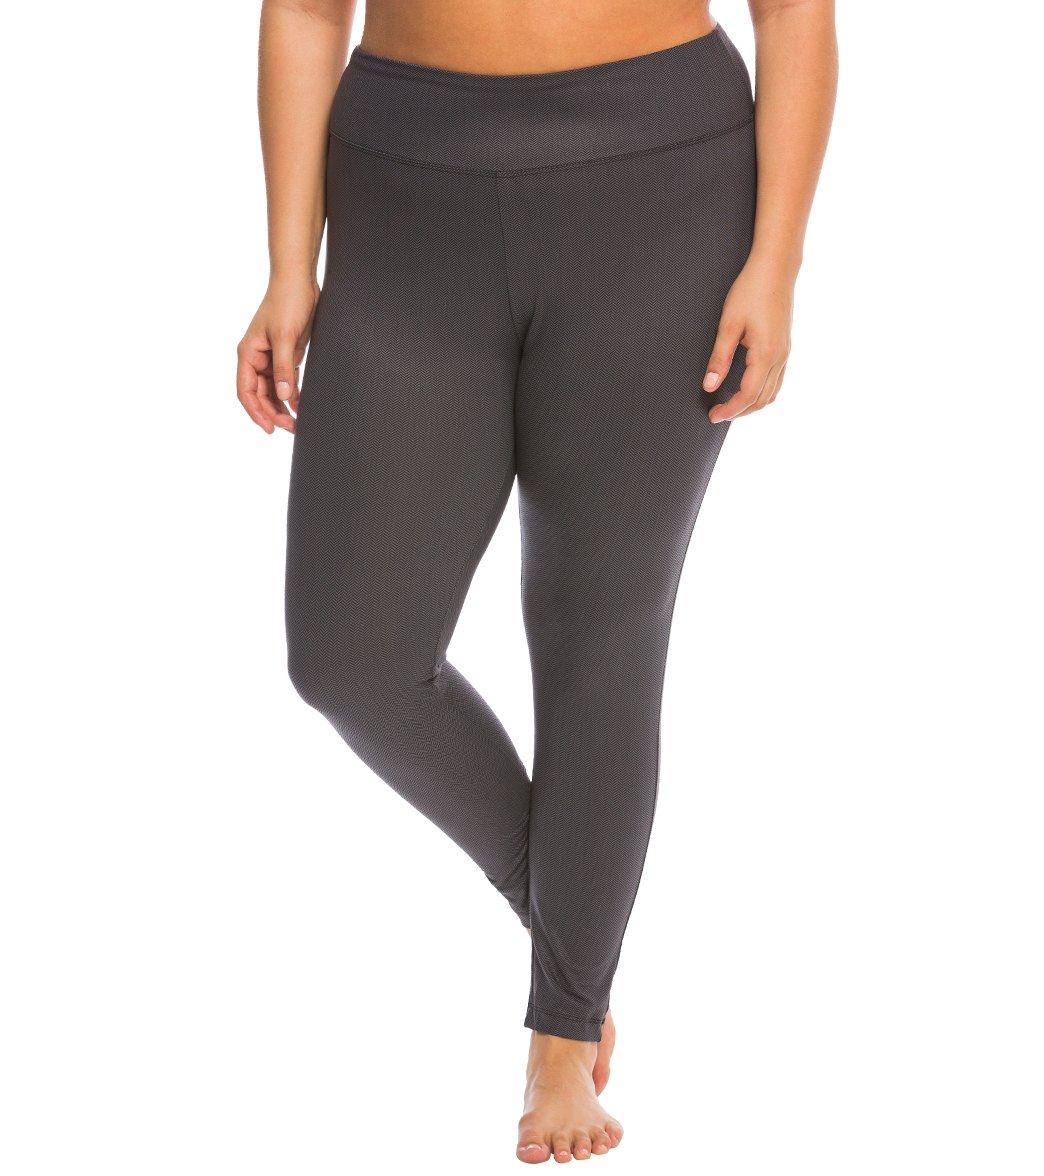 c41f1381495 Marika Plus Size Printed Flat Waist Yoga Leggings at SwimOutlet.com